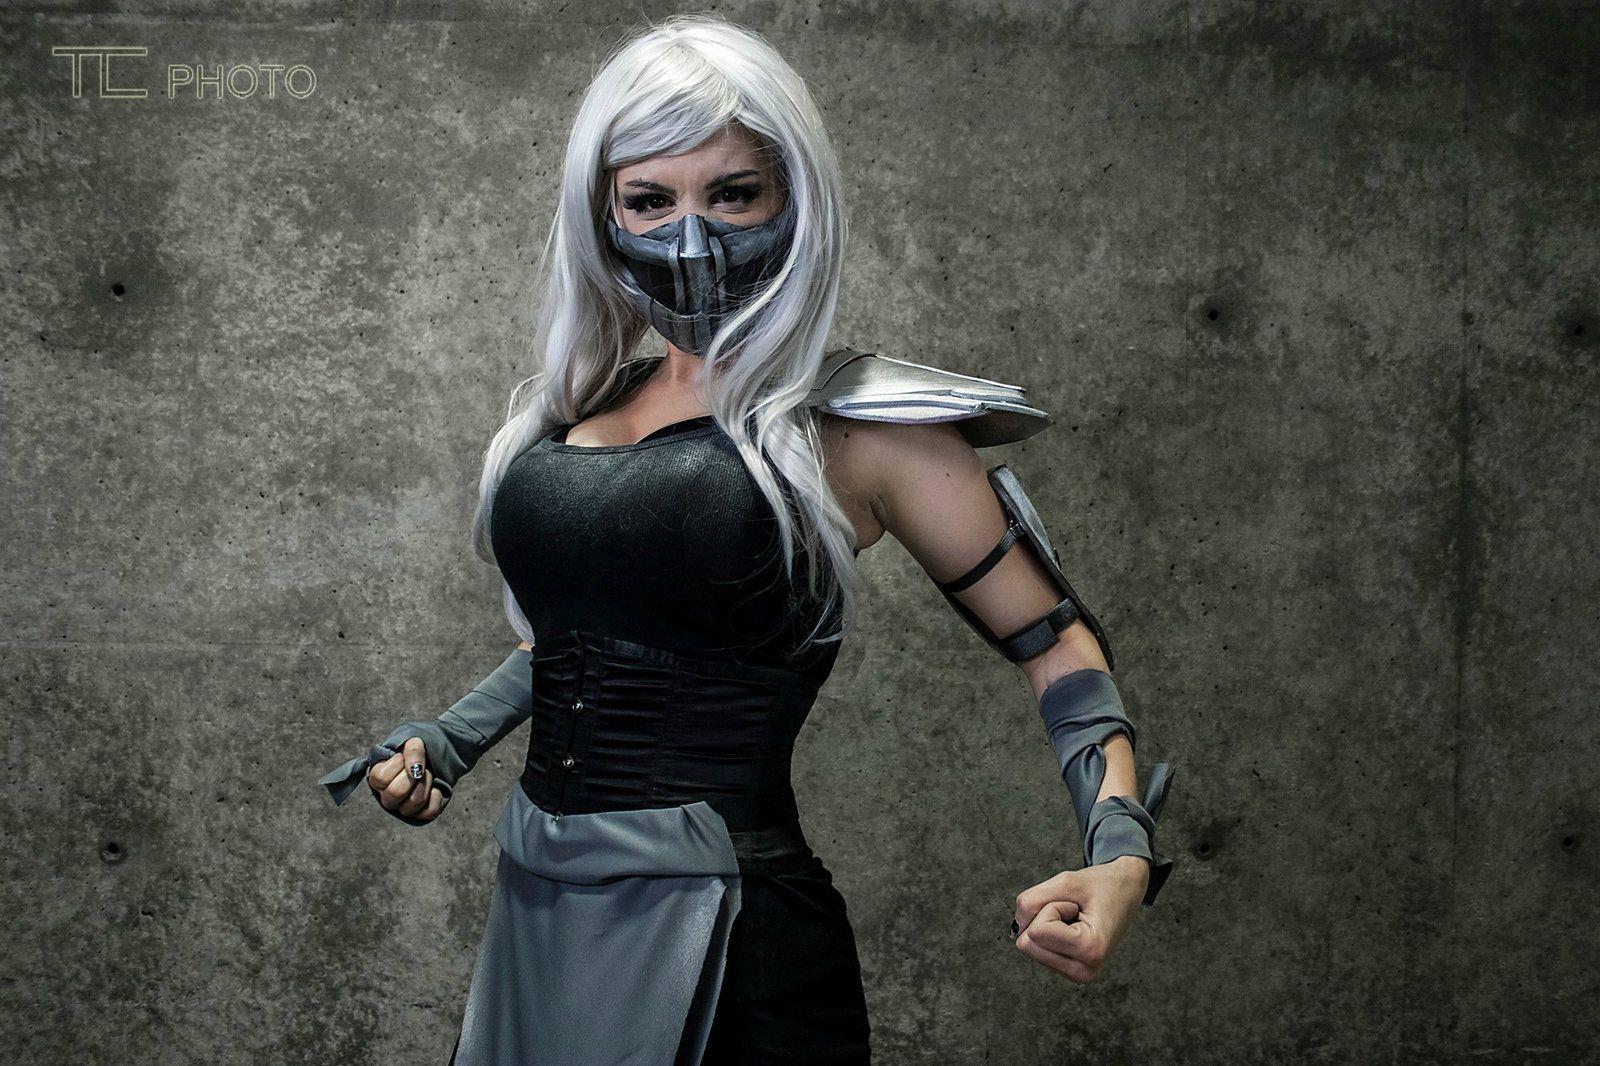 smoke mortal kombat cosplay by - Mortal Kombat Smoke Halloween Costume